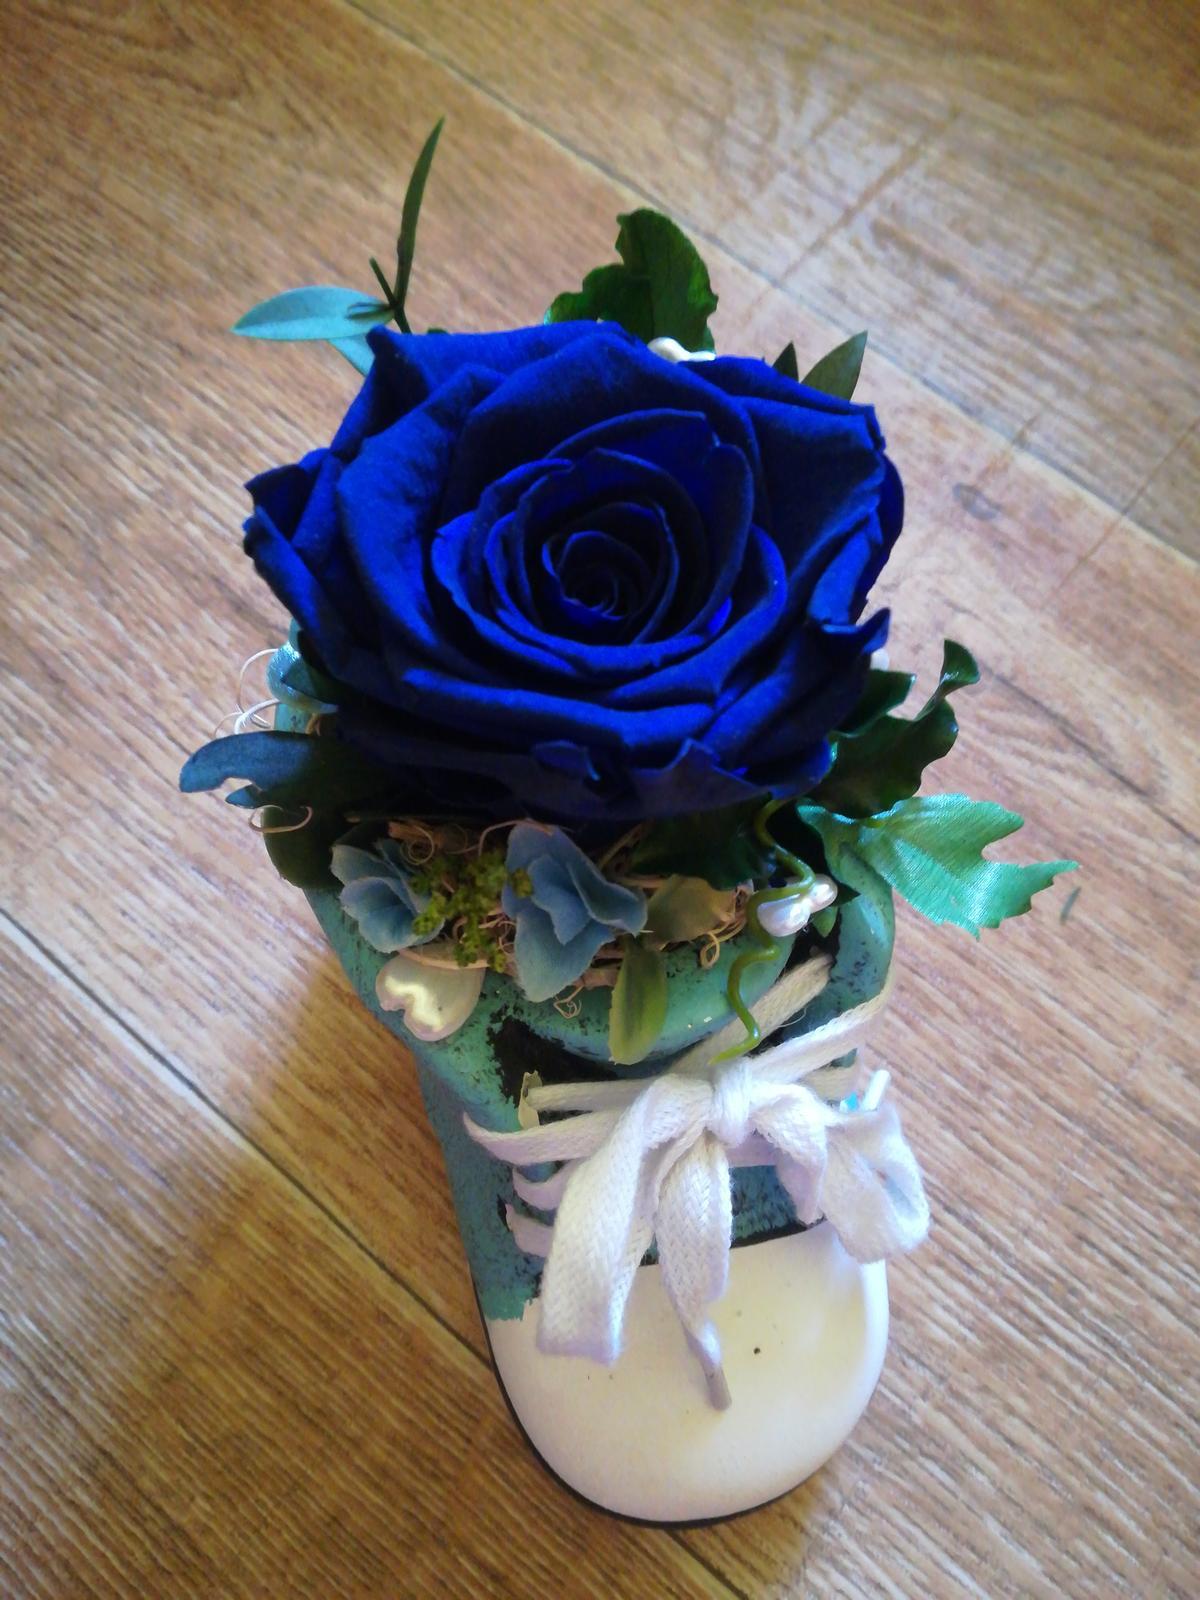 Stabilizovaná ruža, aranžmán  - Obrázok č. 1